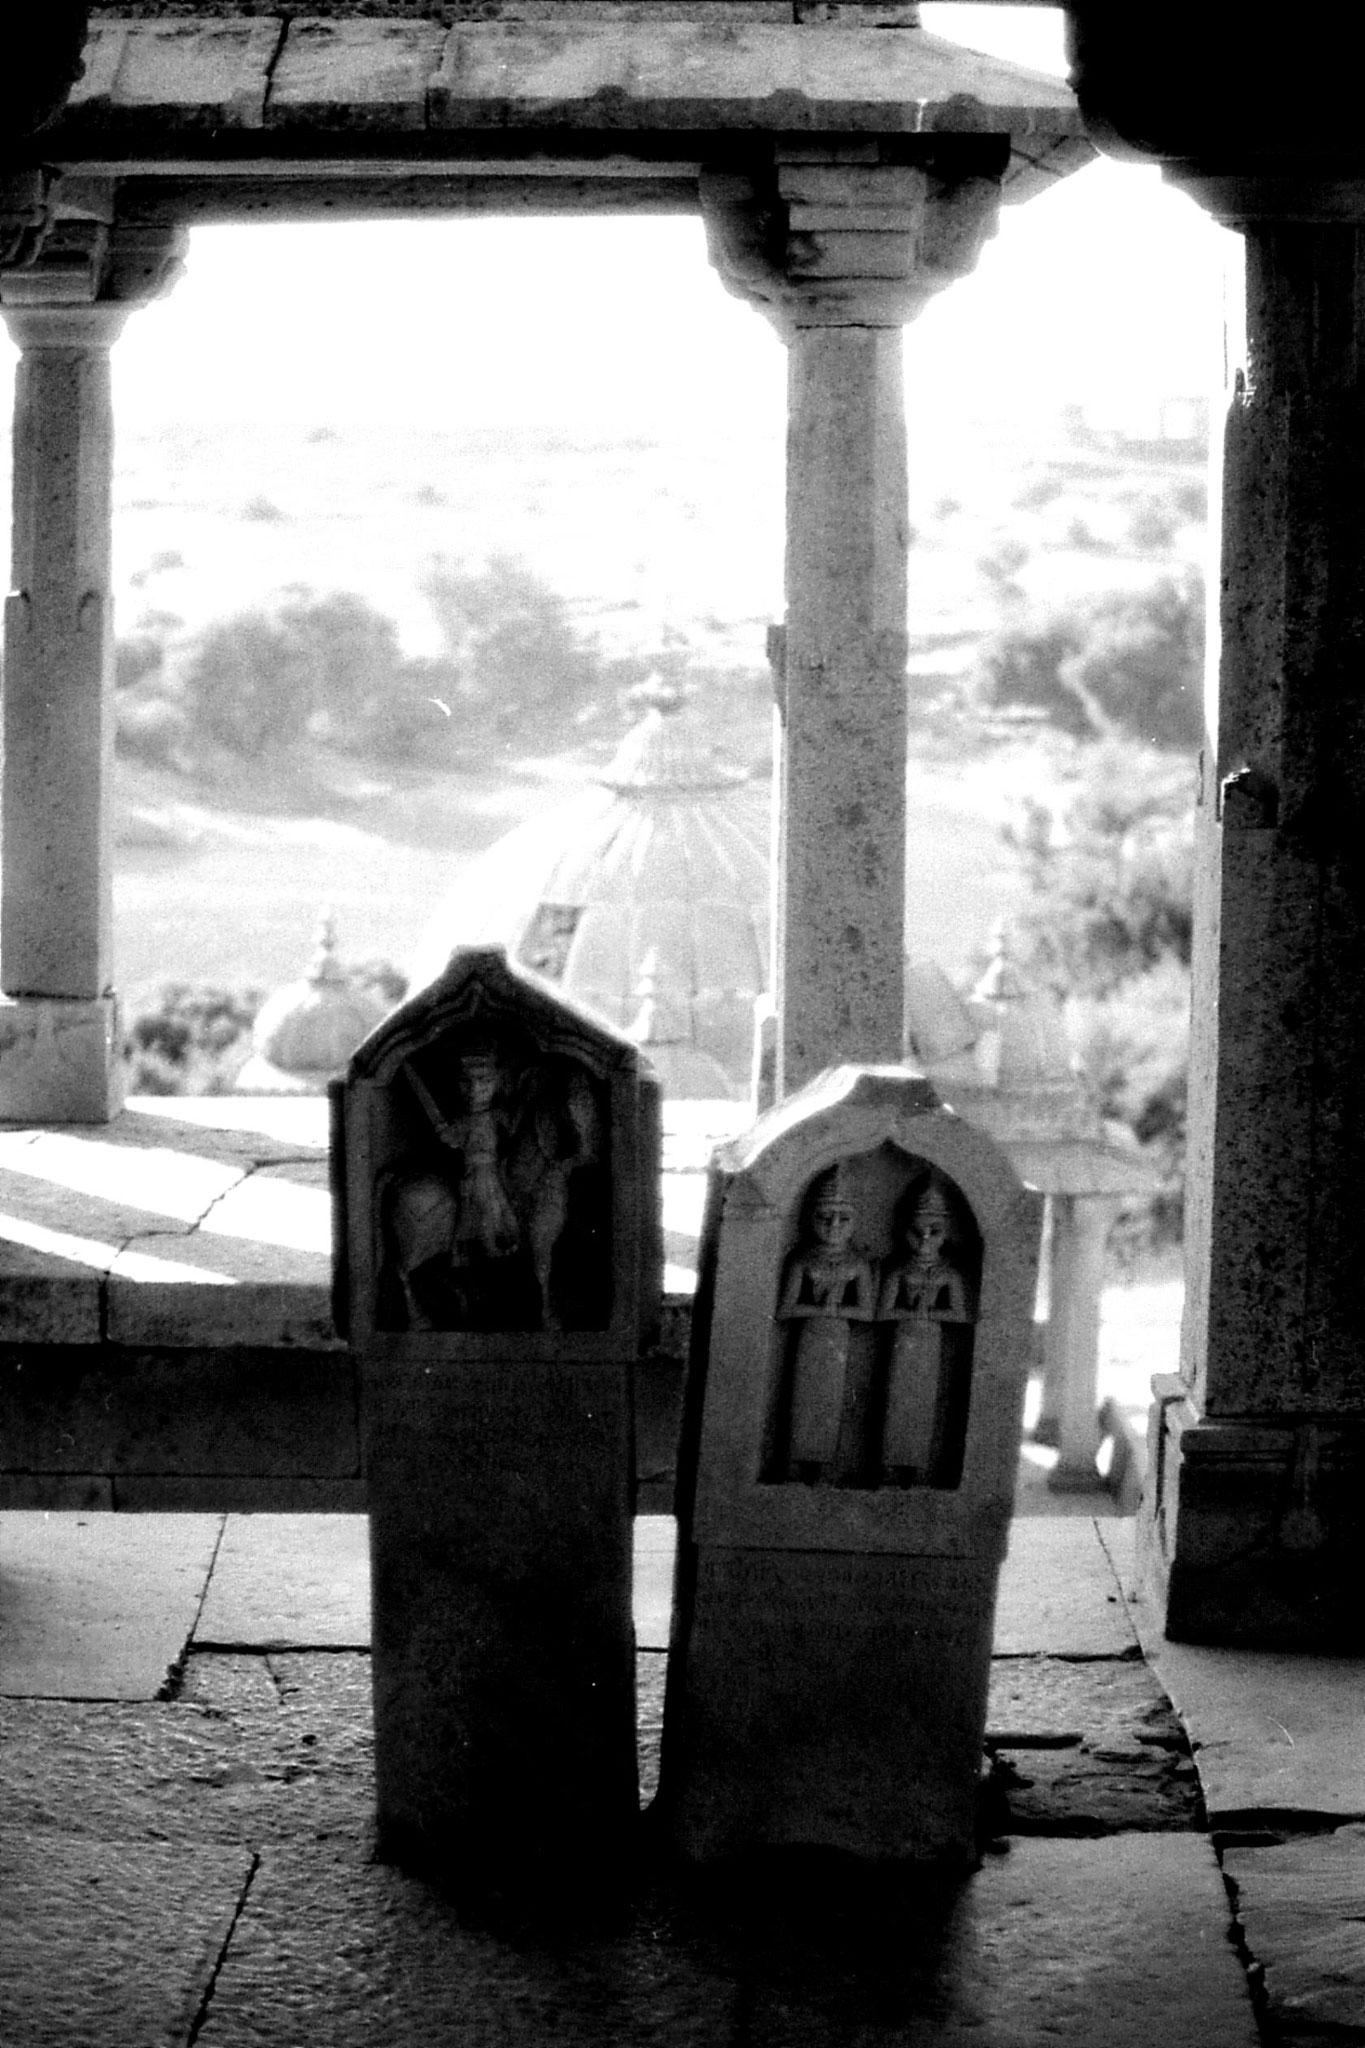 4/12/1989: 5: Jaisalmer cenotaph